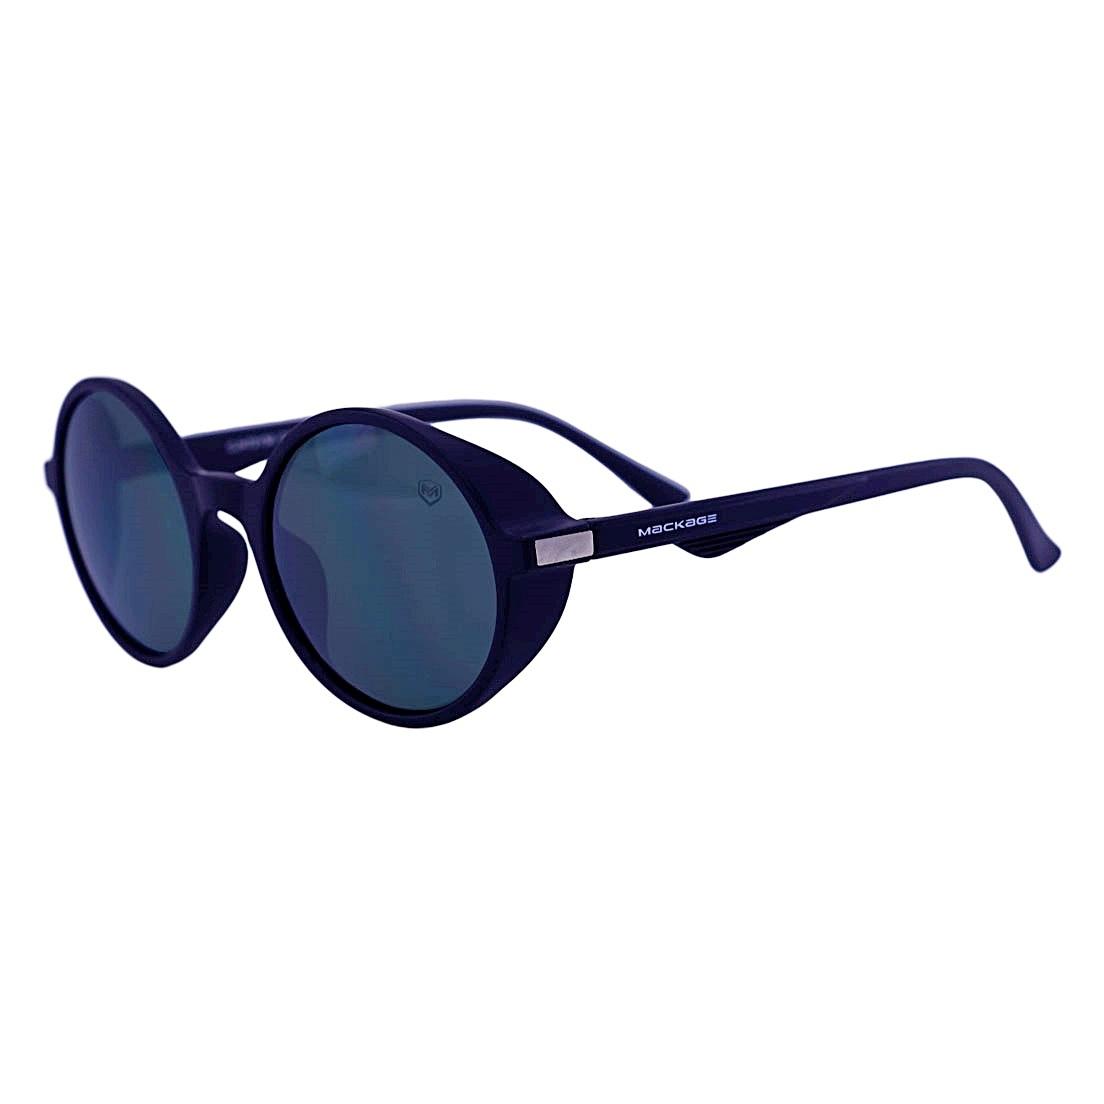 Óculos De Sol Mackage Masculino Acetato Redondo Steampunk  - Preto Fosco